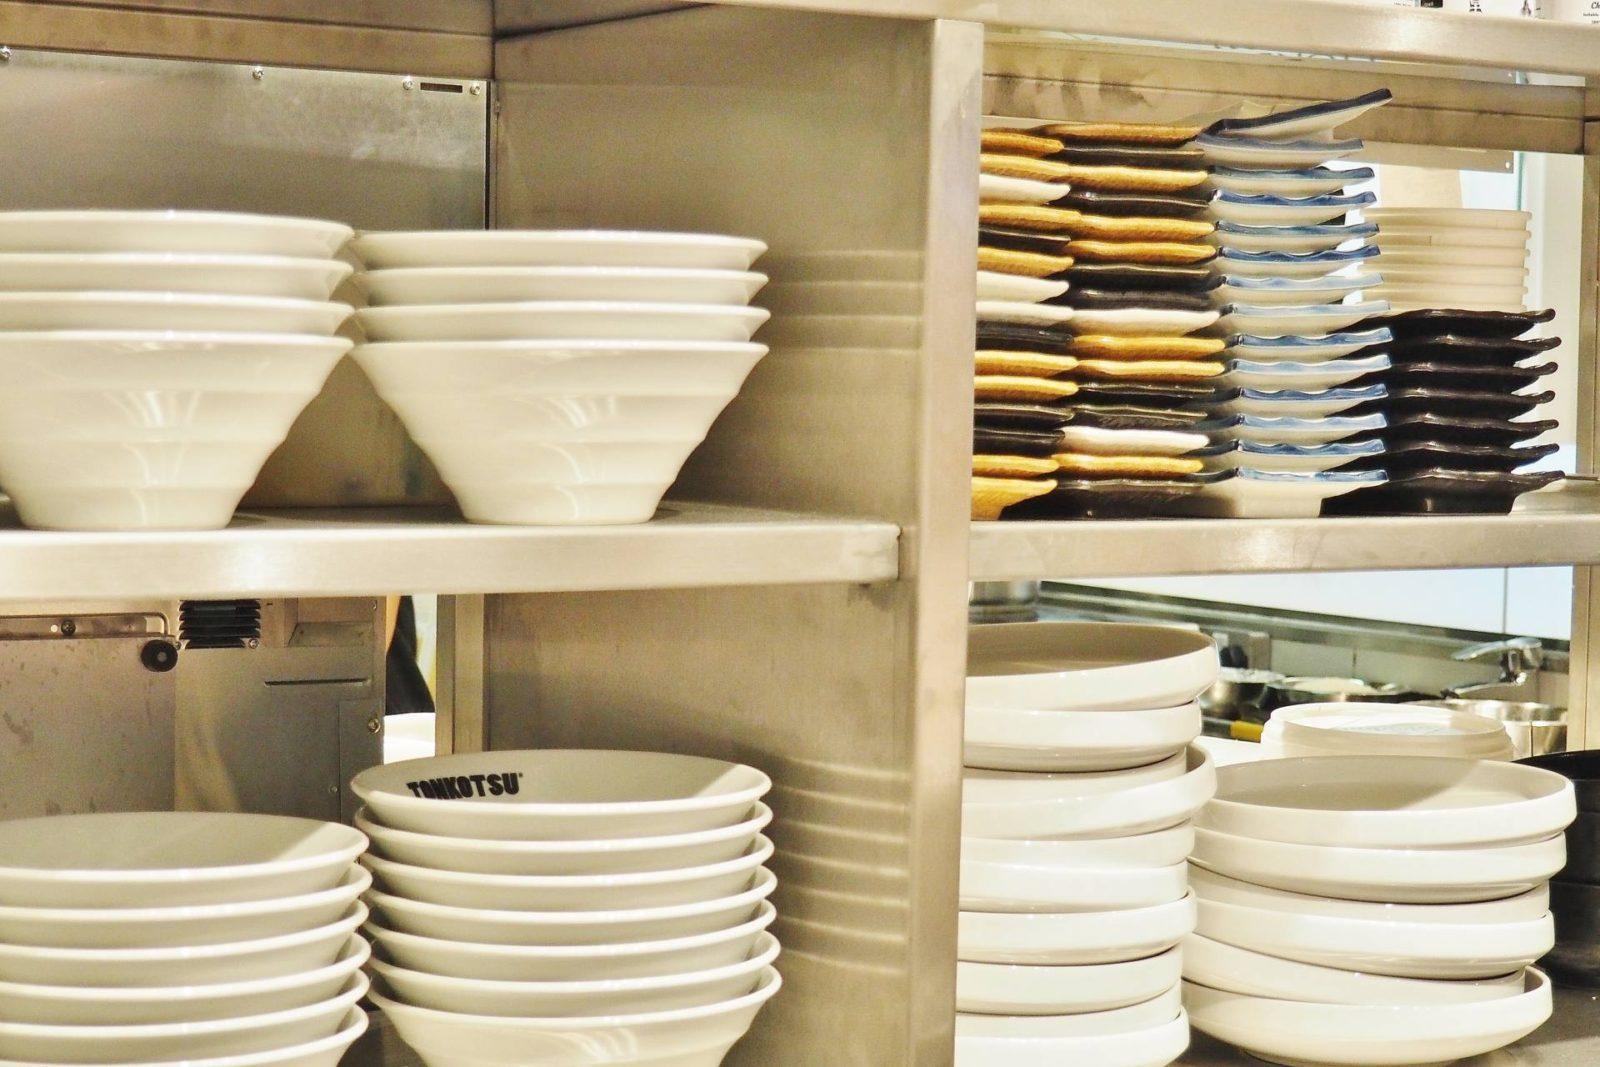 Tonkotsu-Dinner-Plates-Selfriges-Birmingham